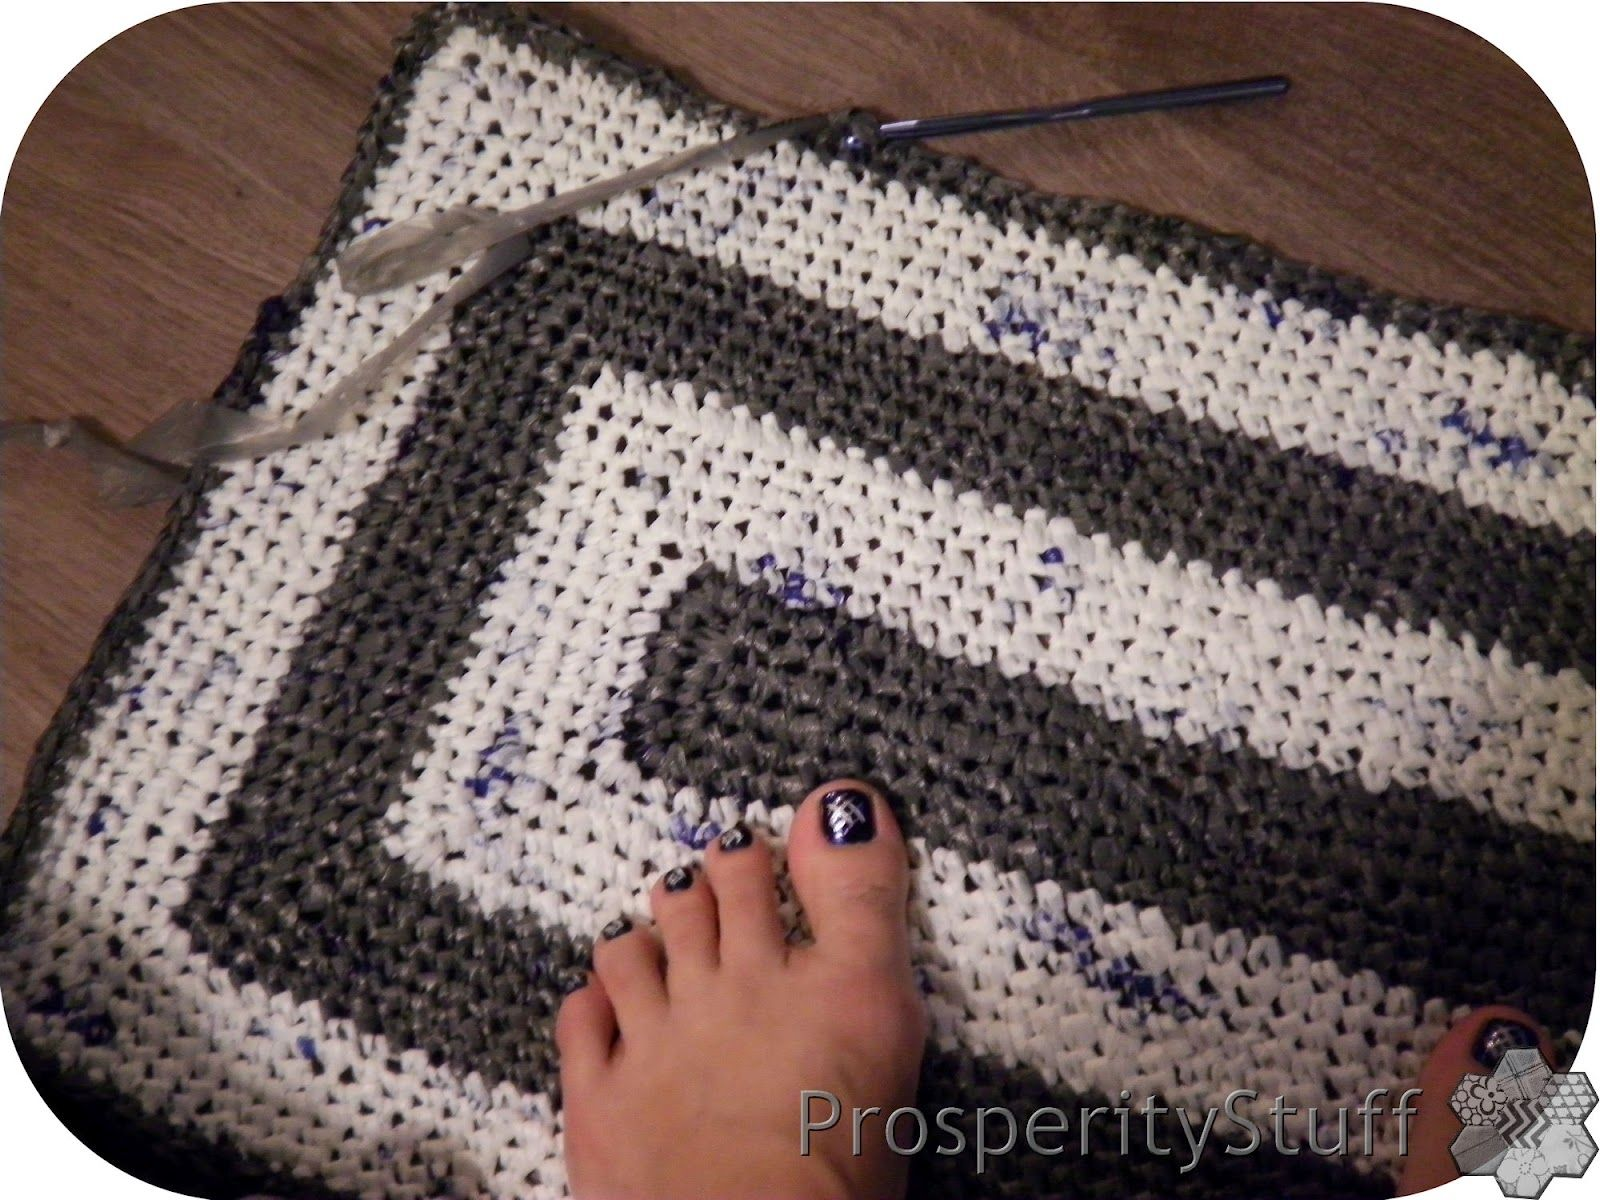 Prosperitystuff Quilts The Plarn Rug Plastic Bag Crochet Crochet Bead Crochet